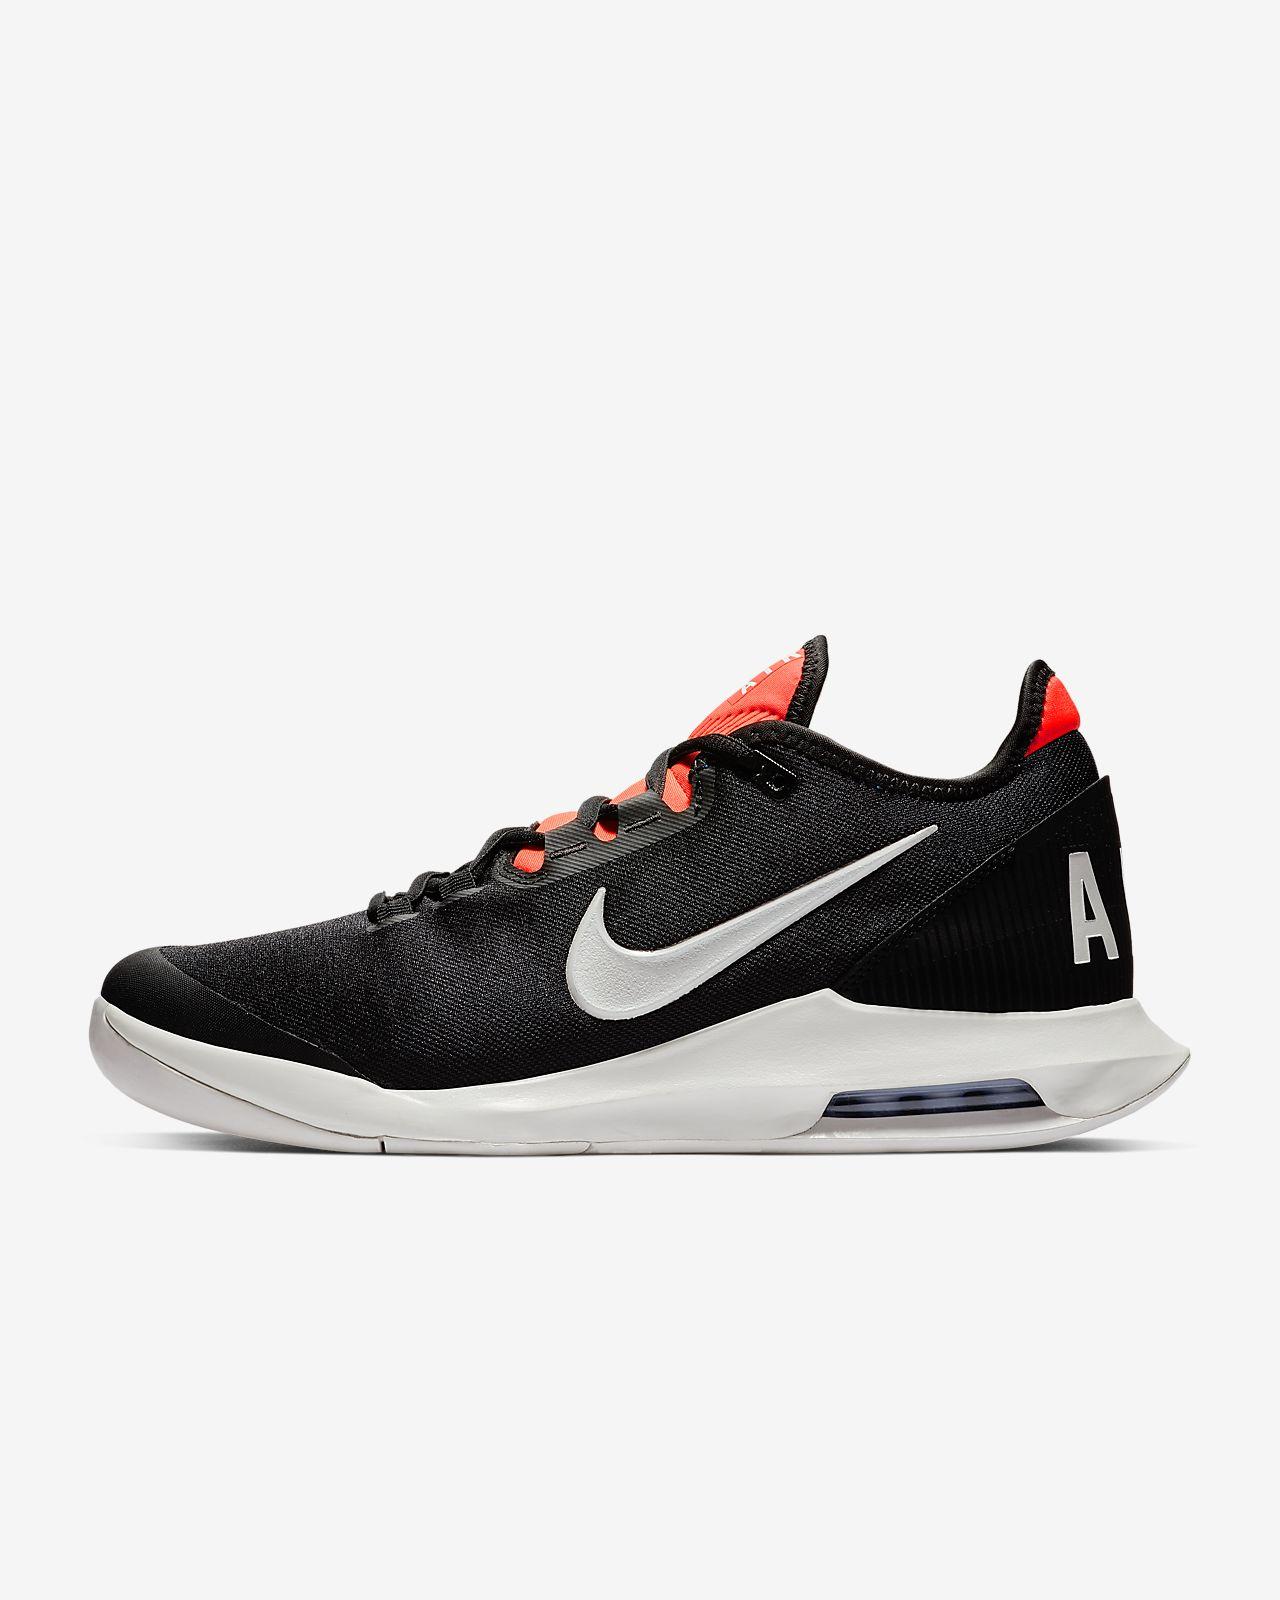 new product ba779 912d1 ... NikeCourt Air Max Wildcard Zapatillas de tenis - Hombre